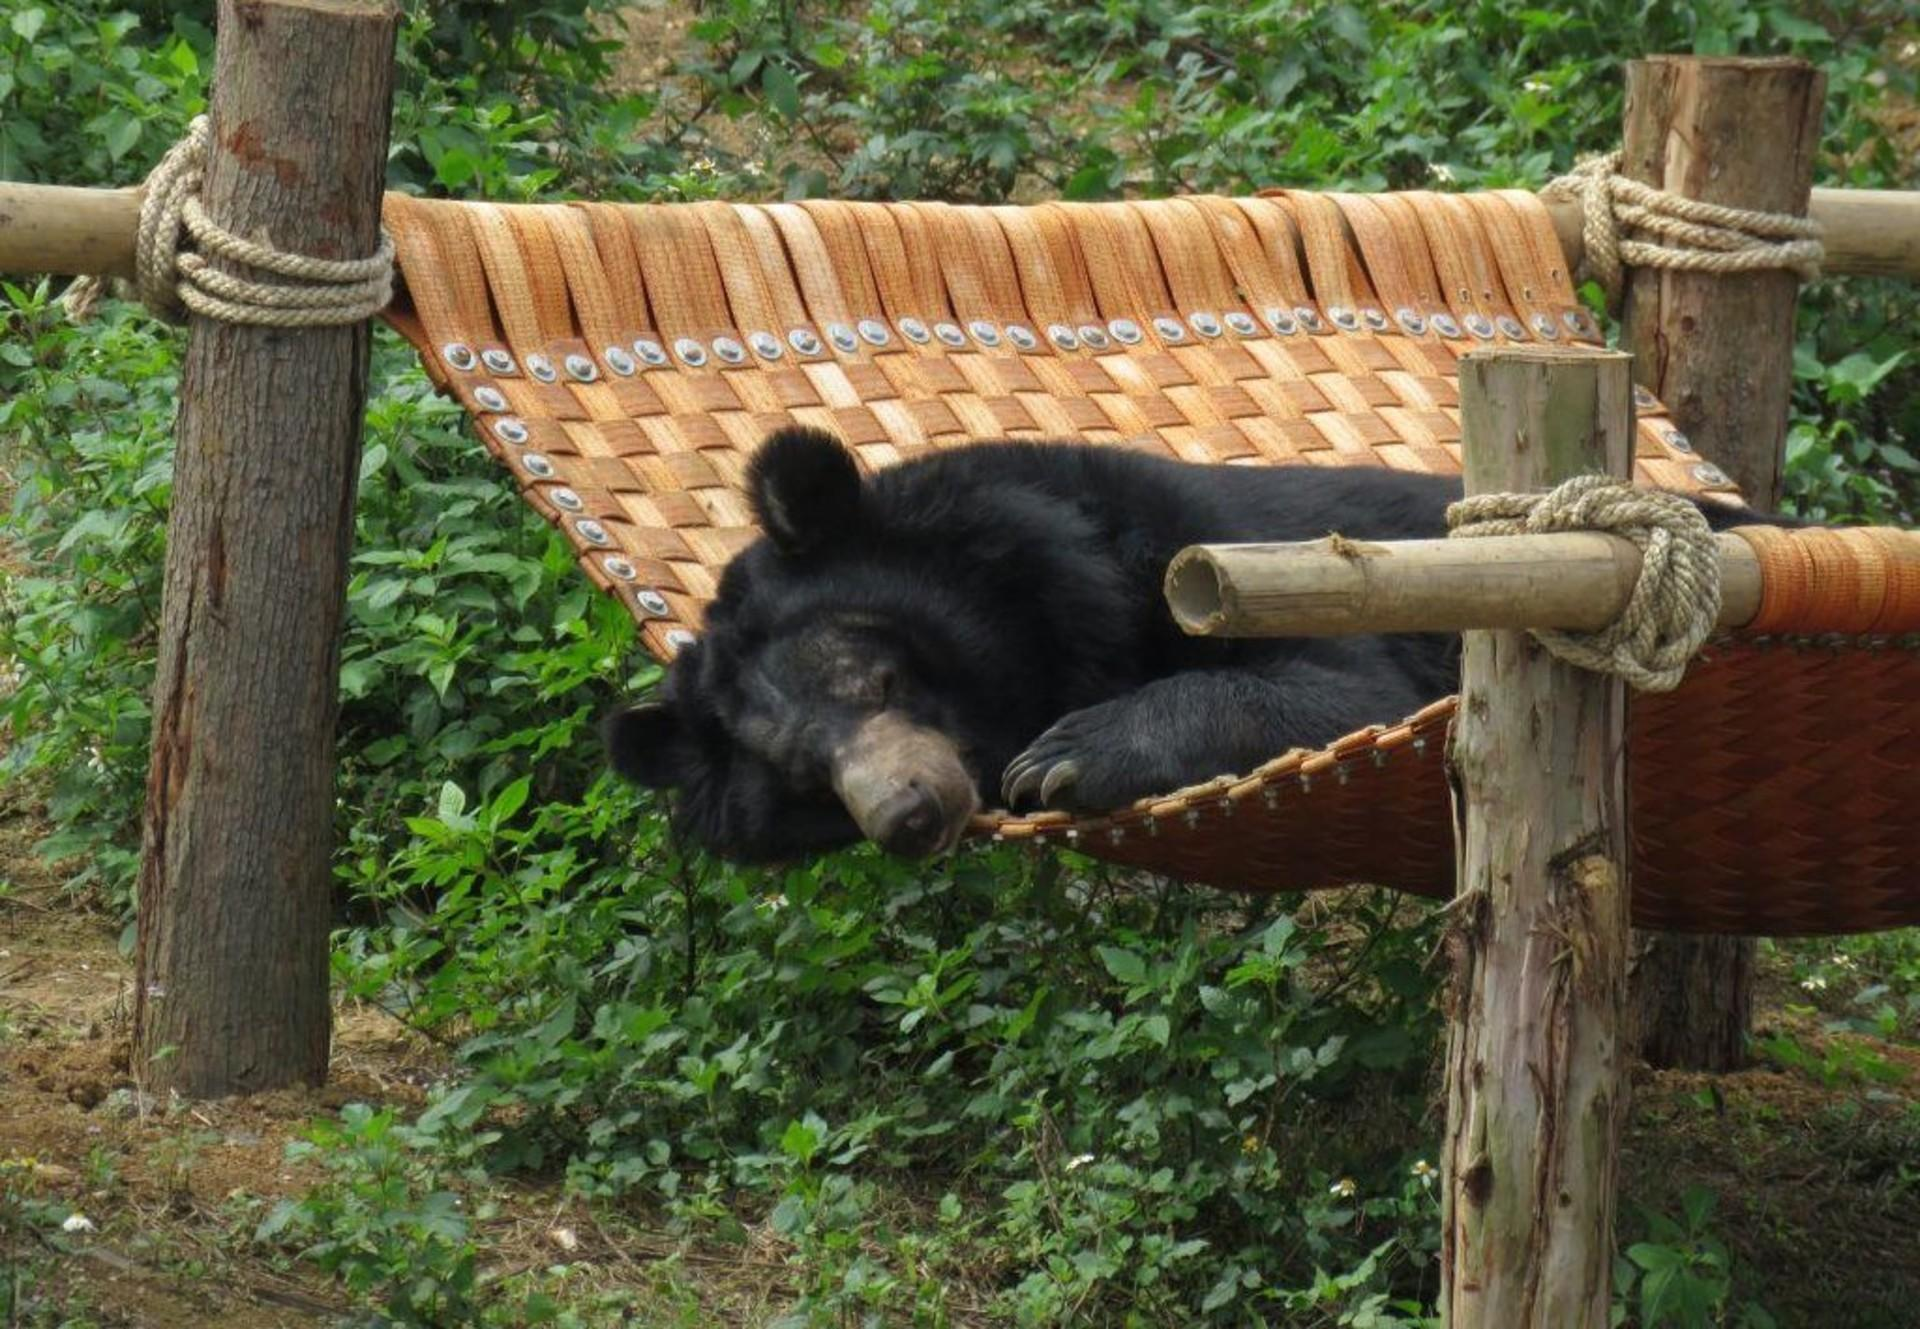 Black bear in the hammock